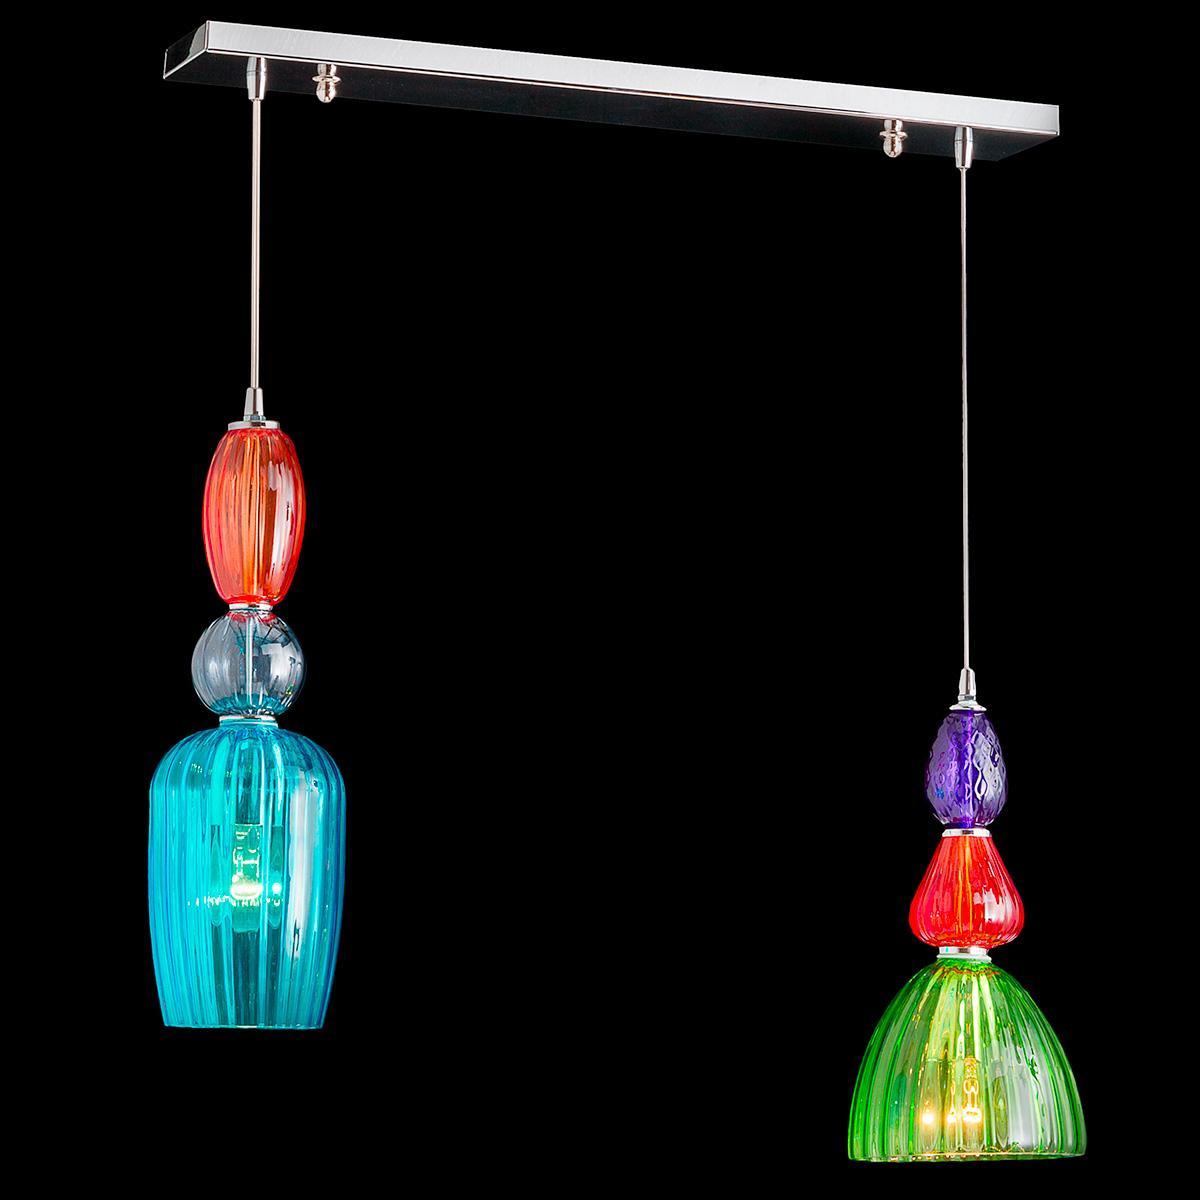 """Millie"" lámpara colgante en cristal de Murano - 2 luce - multicolore"